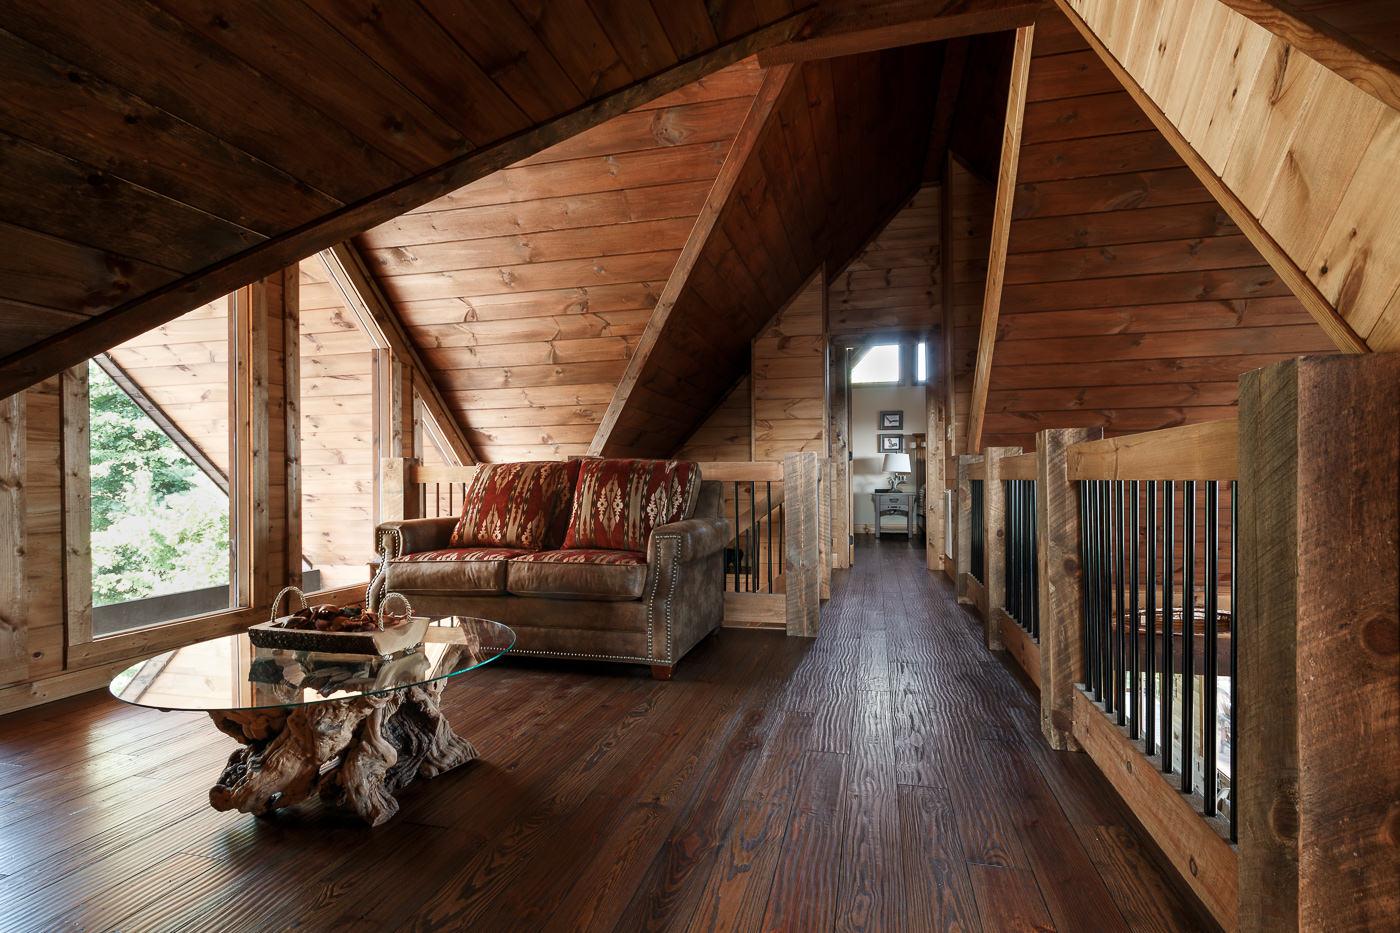 Architecture-Photographer-North-Carolina.jpg